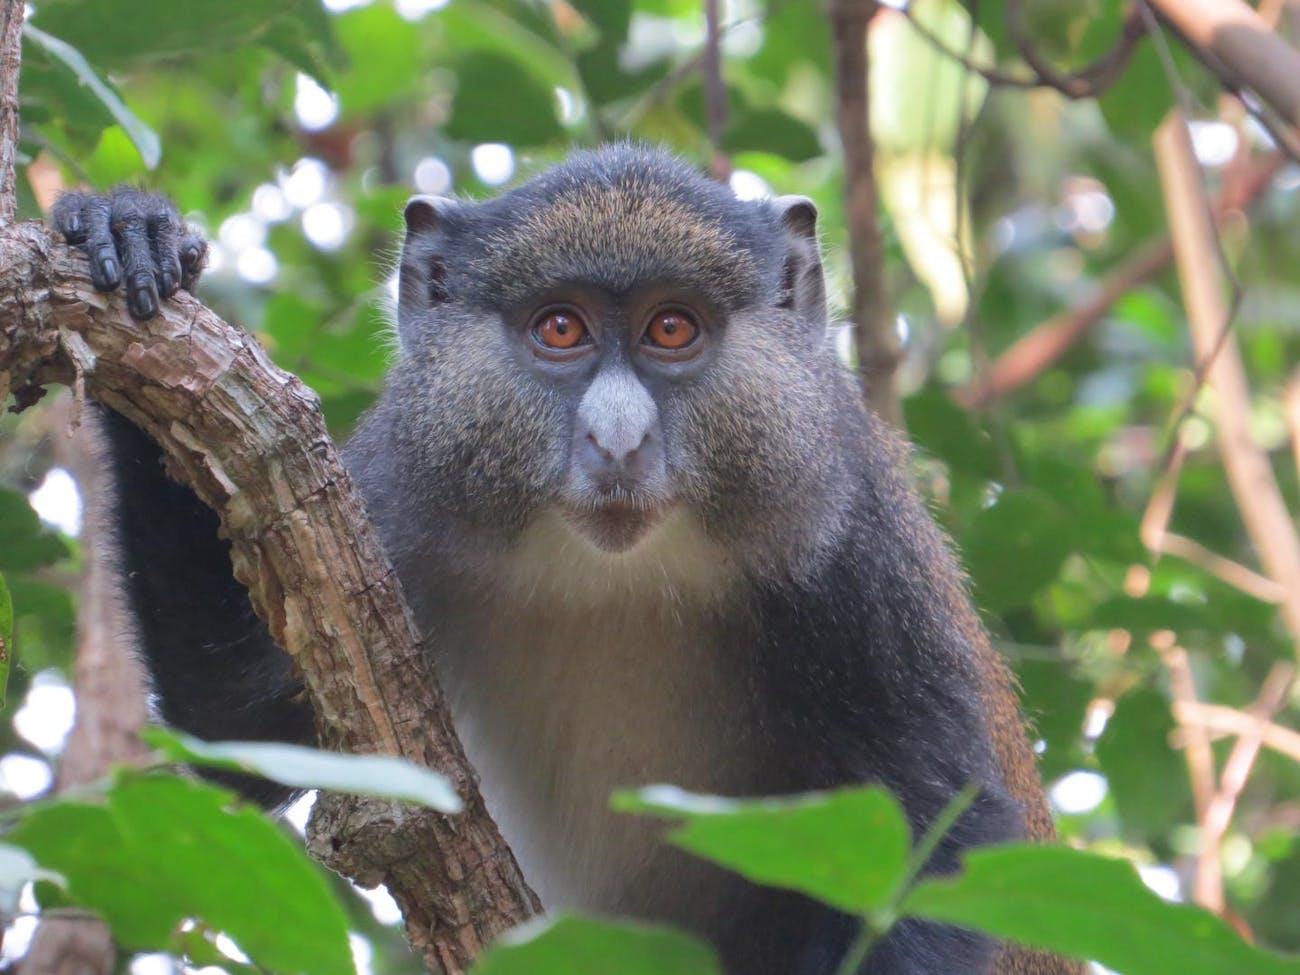 guenon monkey hybrid